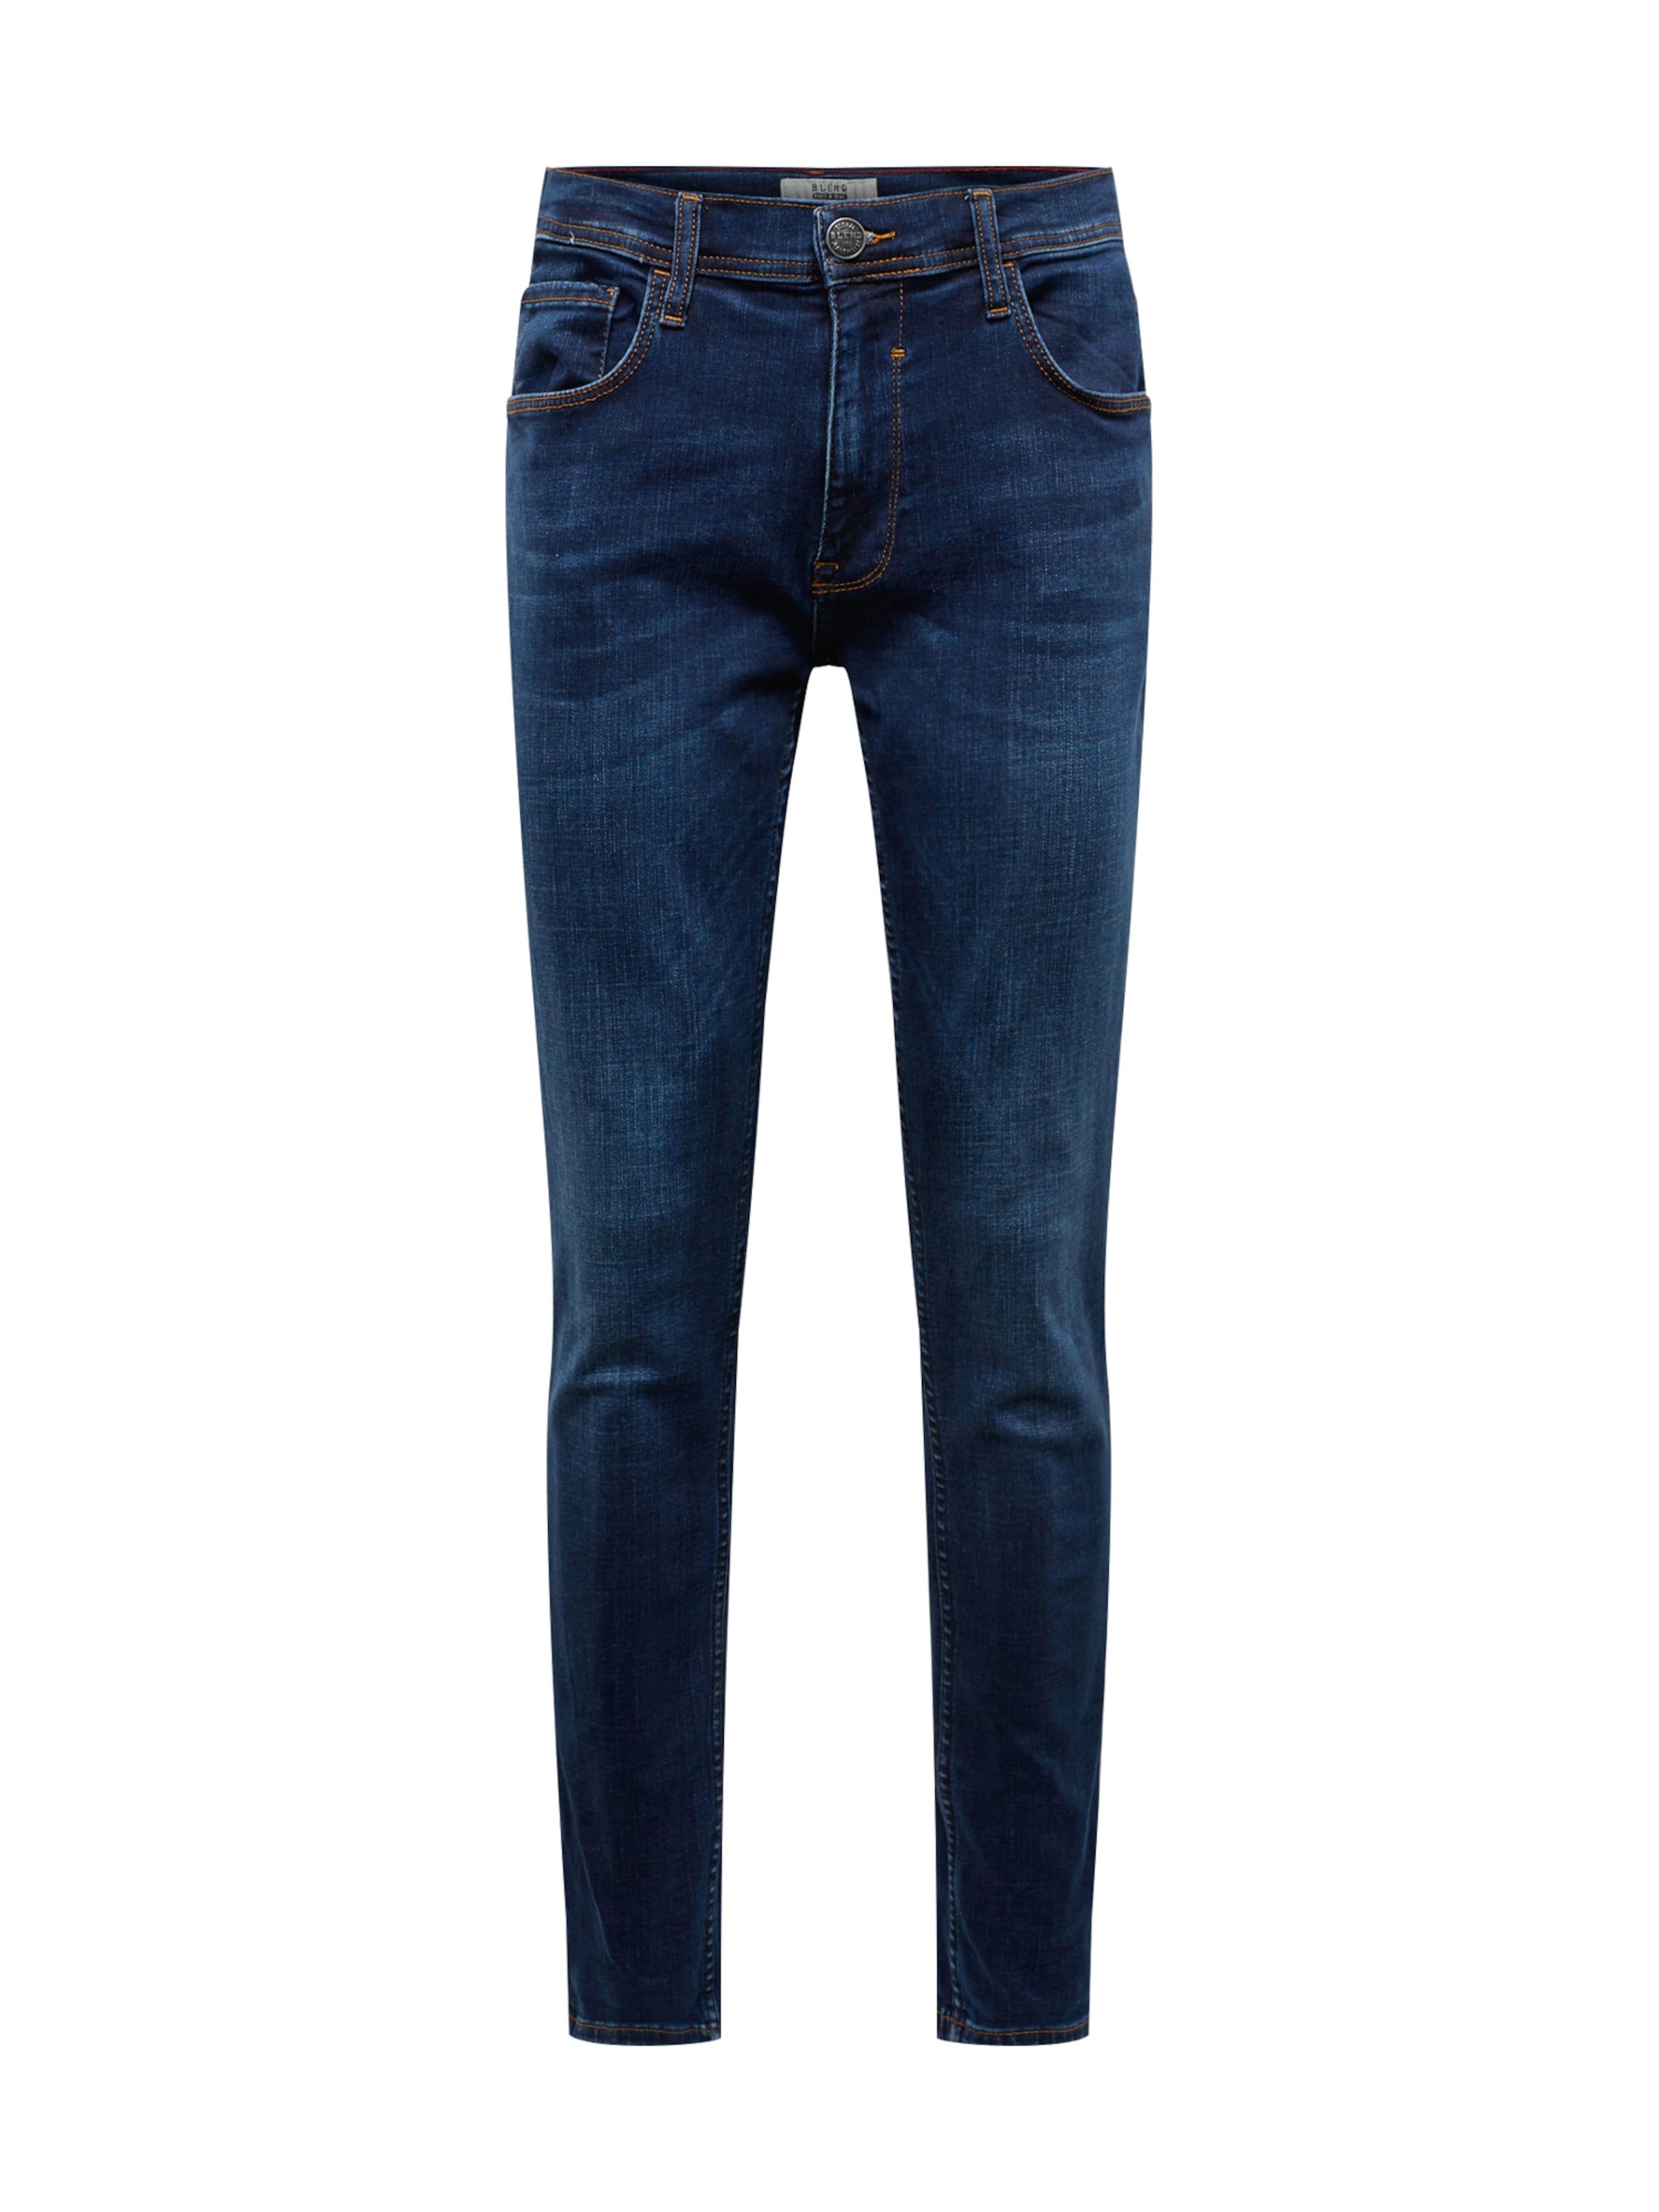 Multiflex' Denim Jeans Taperd Blue 'jet In Blend Slim PX8Nn0wOk